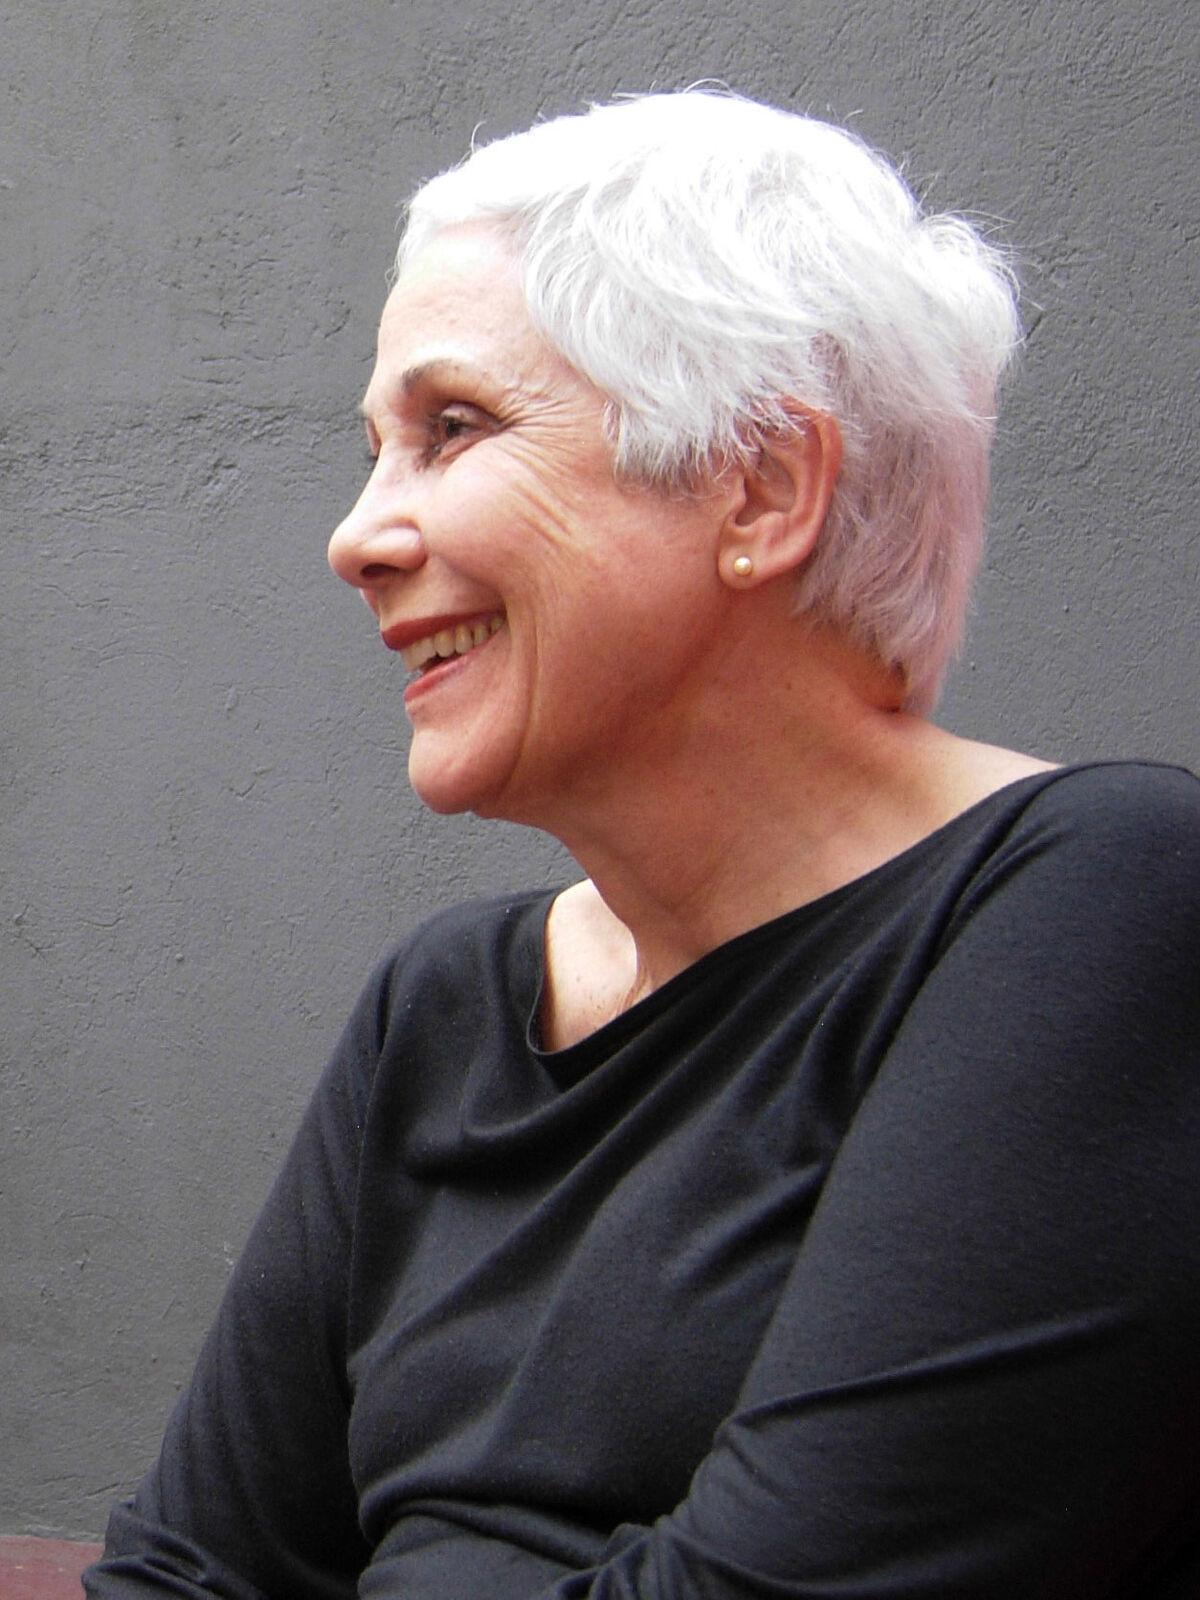 Anna Maria Maiolino by Lívia Gonzaga Bertuzzi. © Anna Maria Maiolino. Courtesy of Hauser & Wirth.